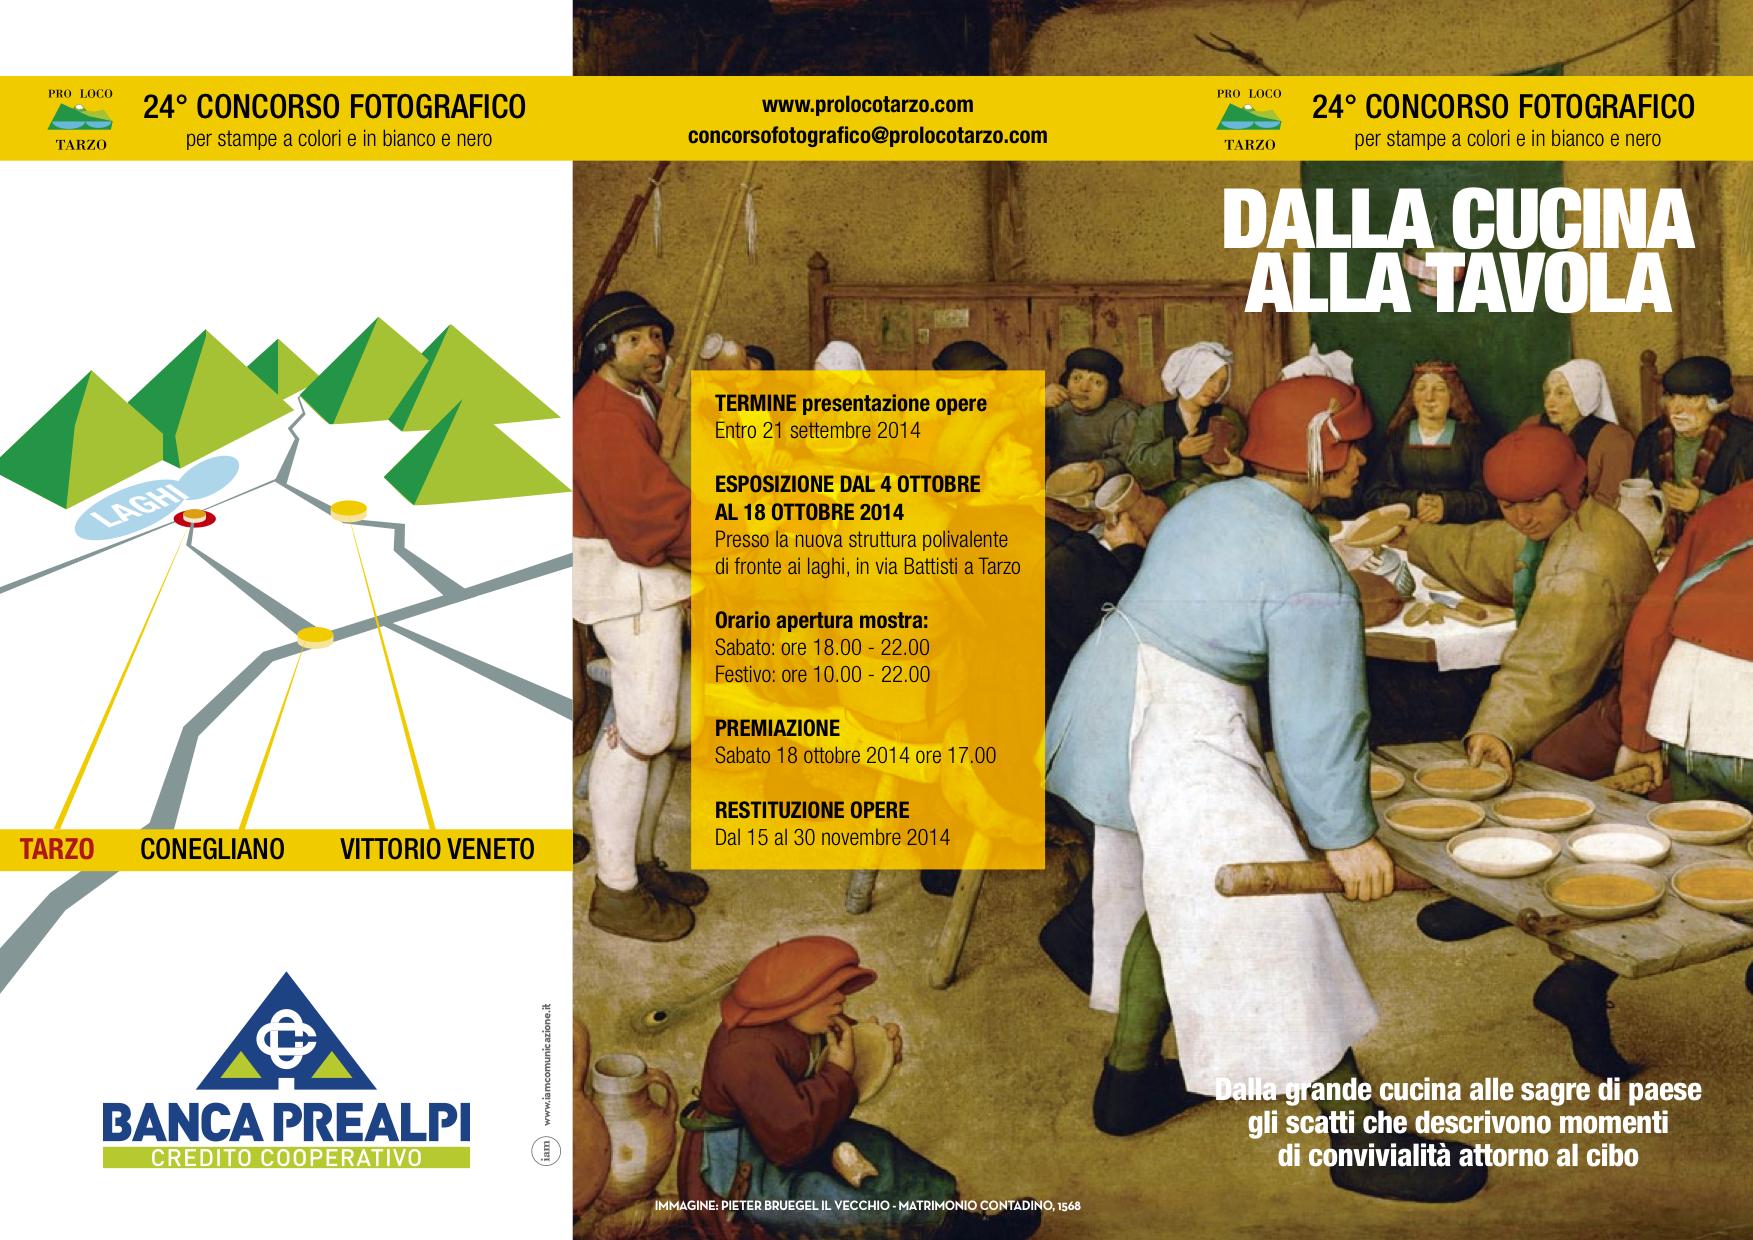 DPL concorso fotografico 2014 web